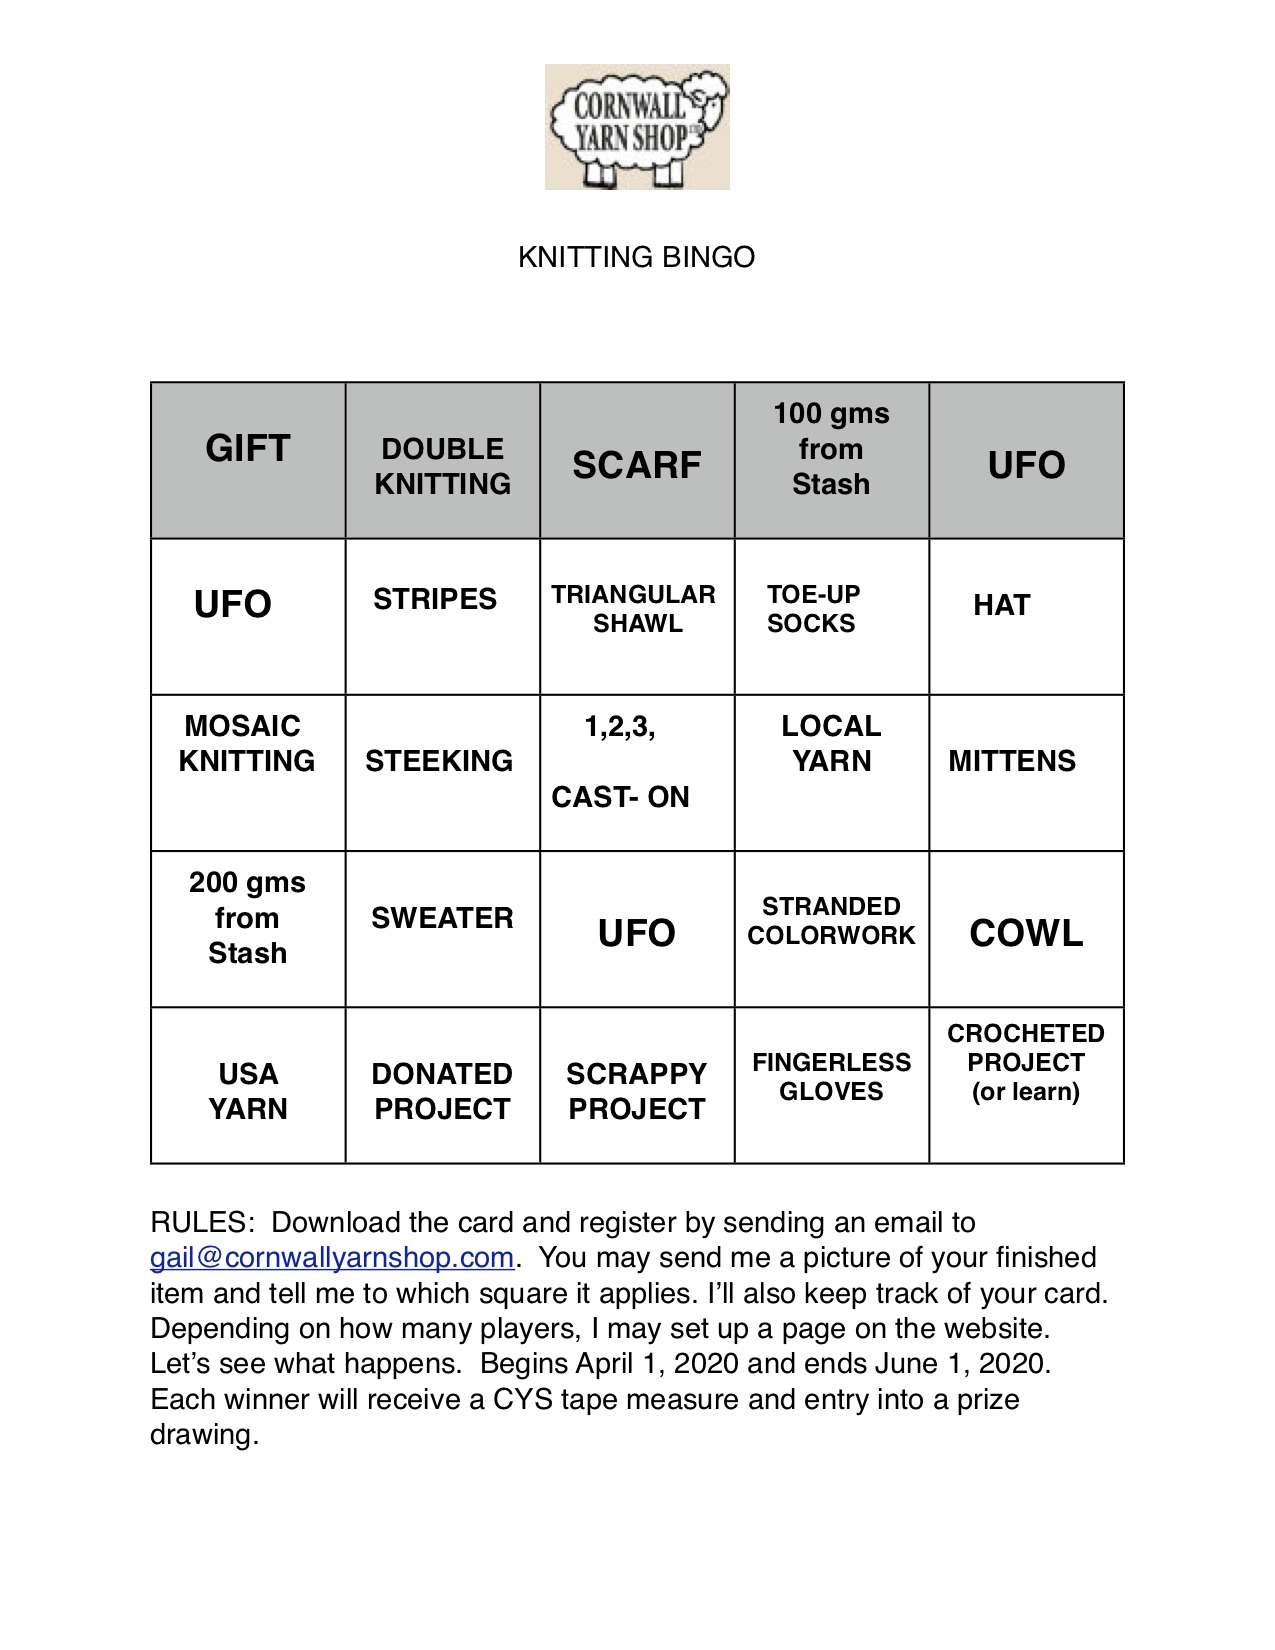 knitting-bingo.jpg